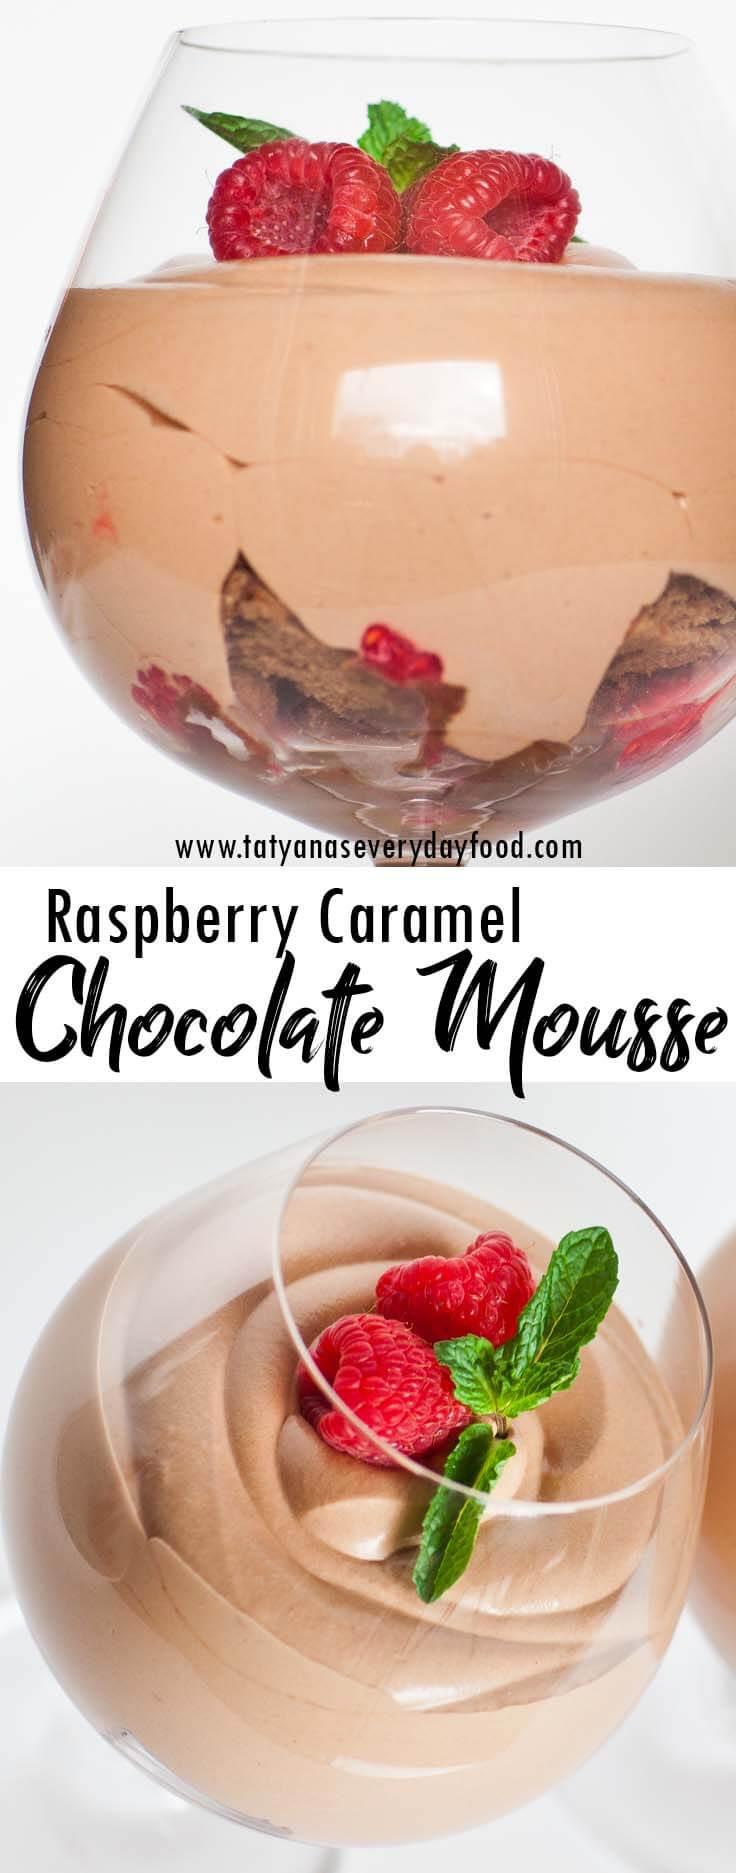 Raspberry Chocolate Mousse Parfaits video recipe